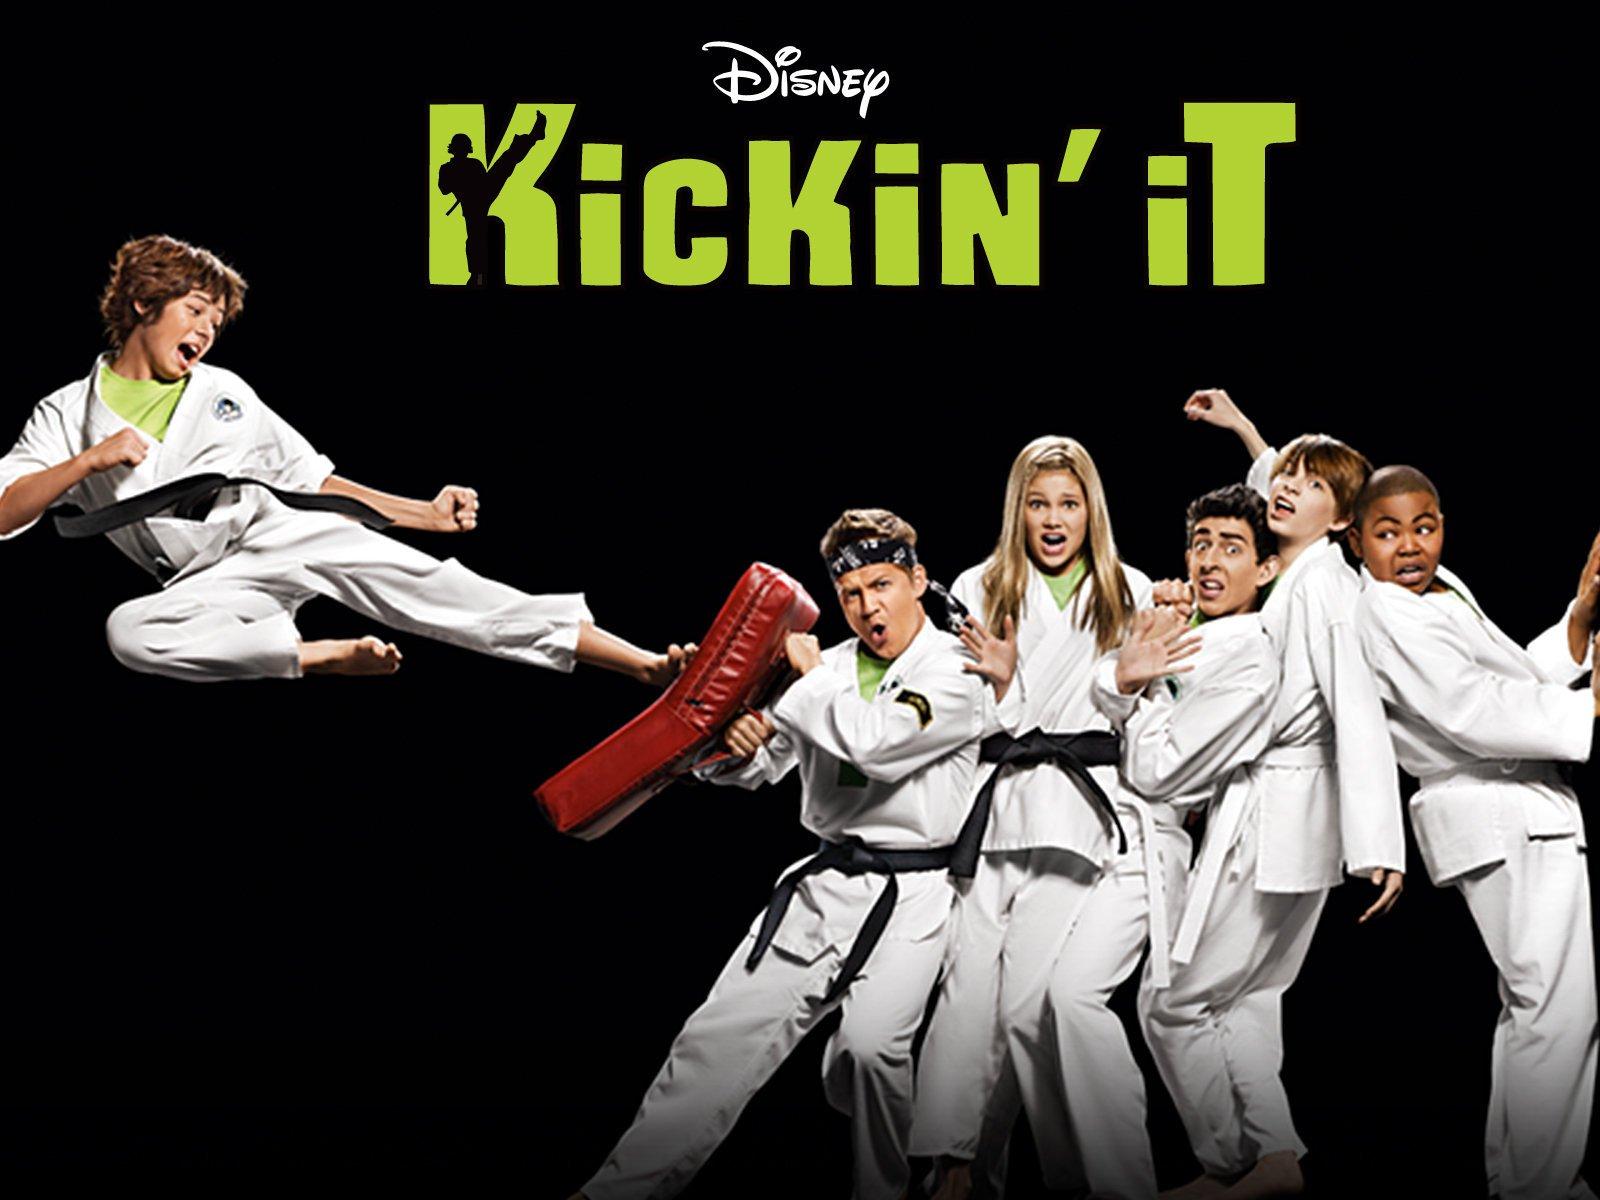 kickin it season 3 episode 4 allshowsdaily